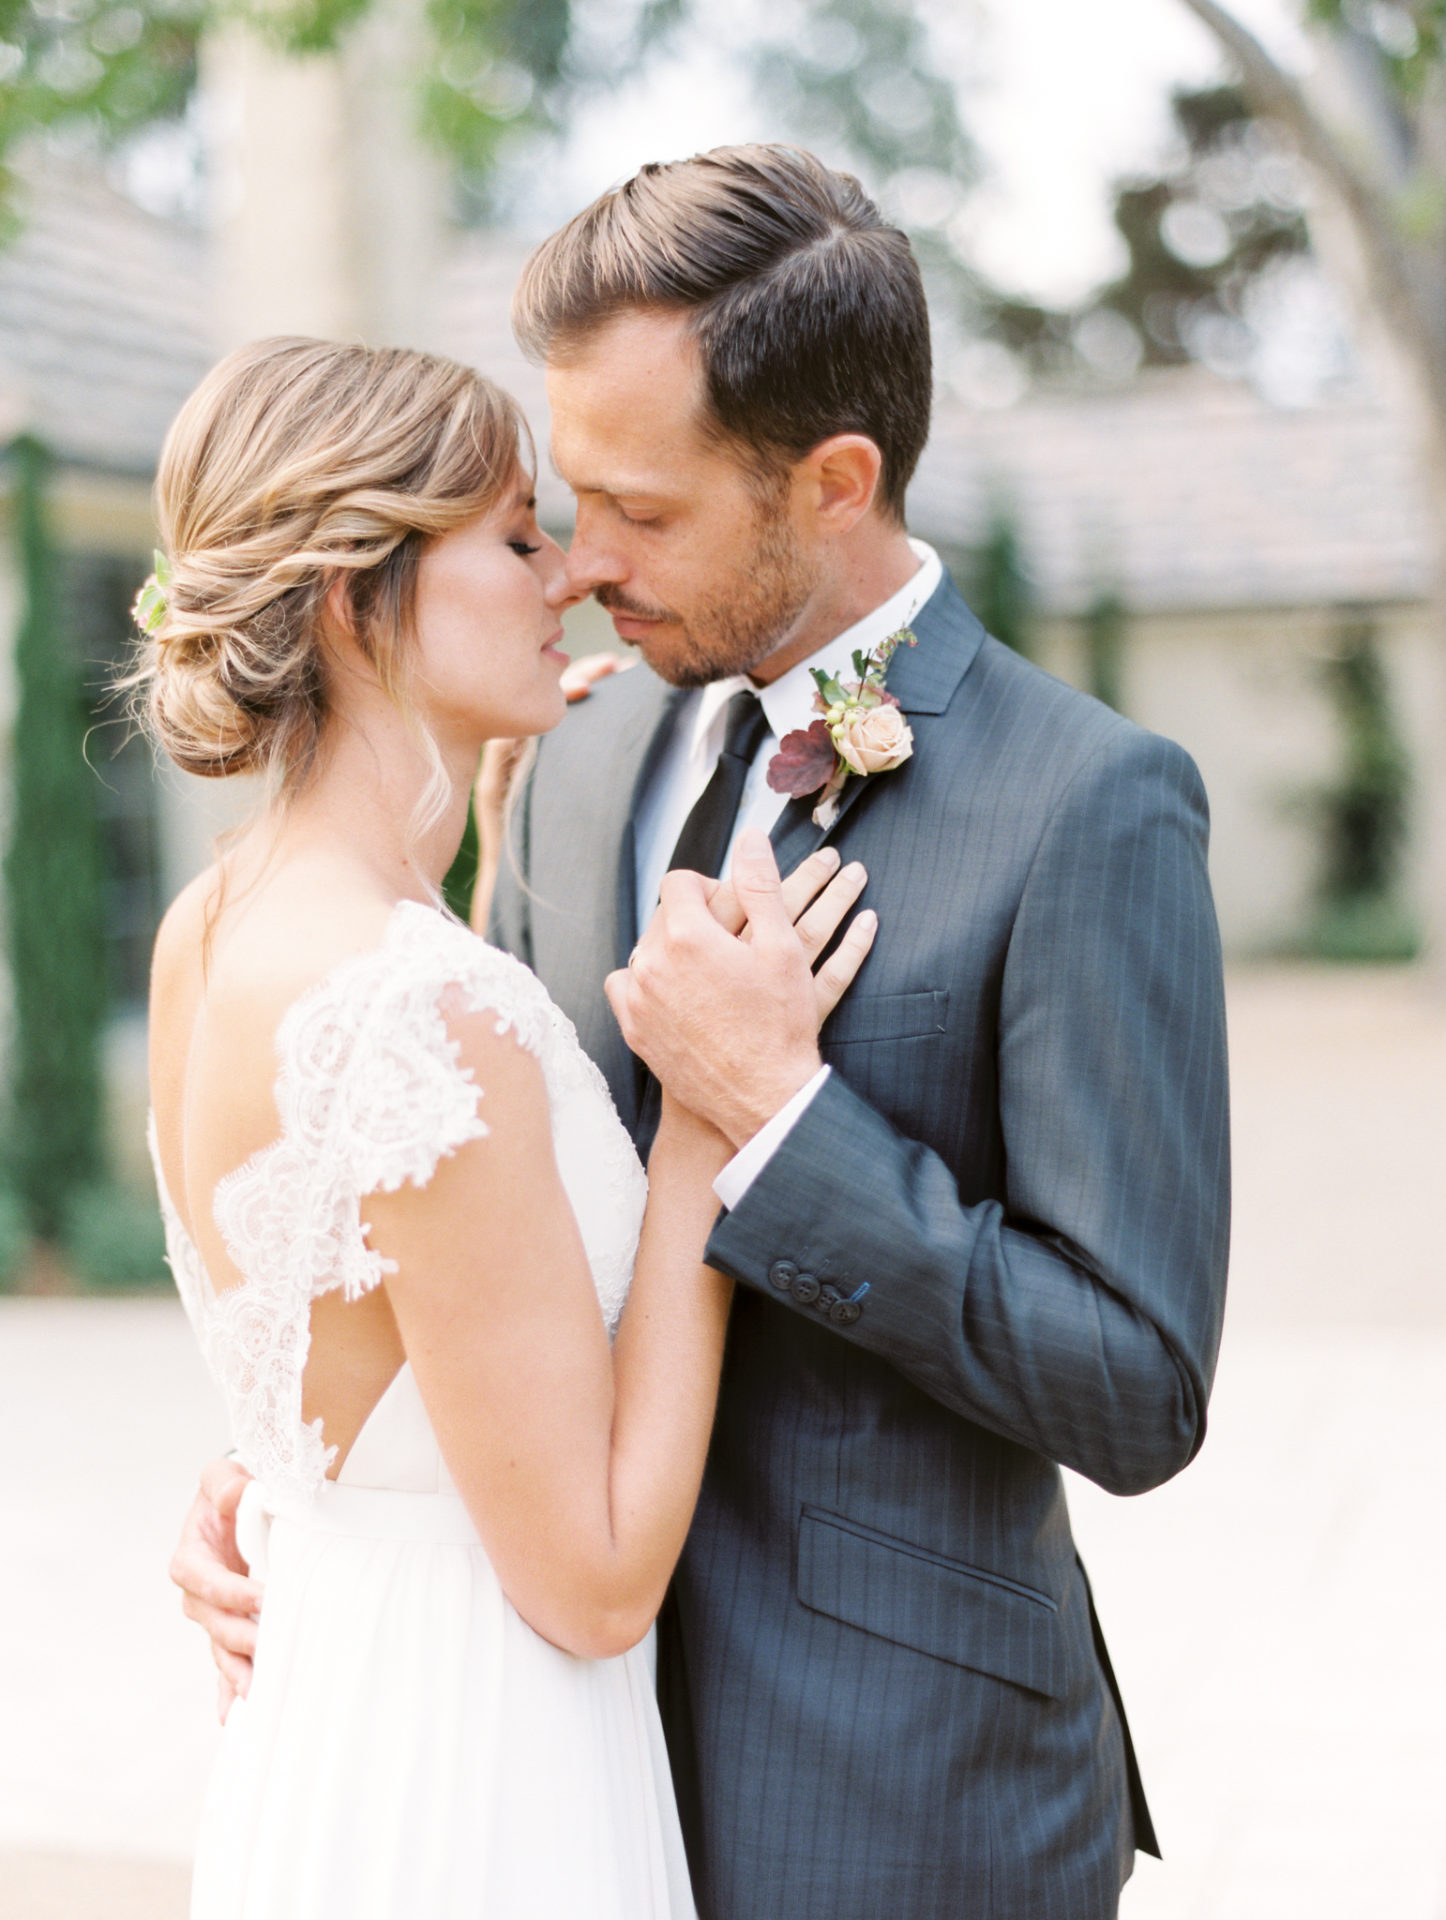 Timeless Spring Wedding Design With A Modern Twist Couple Portrait